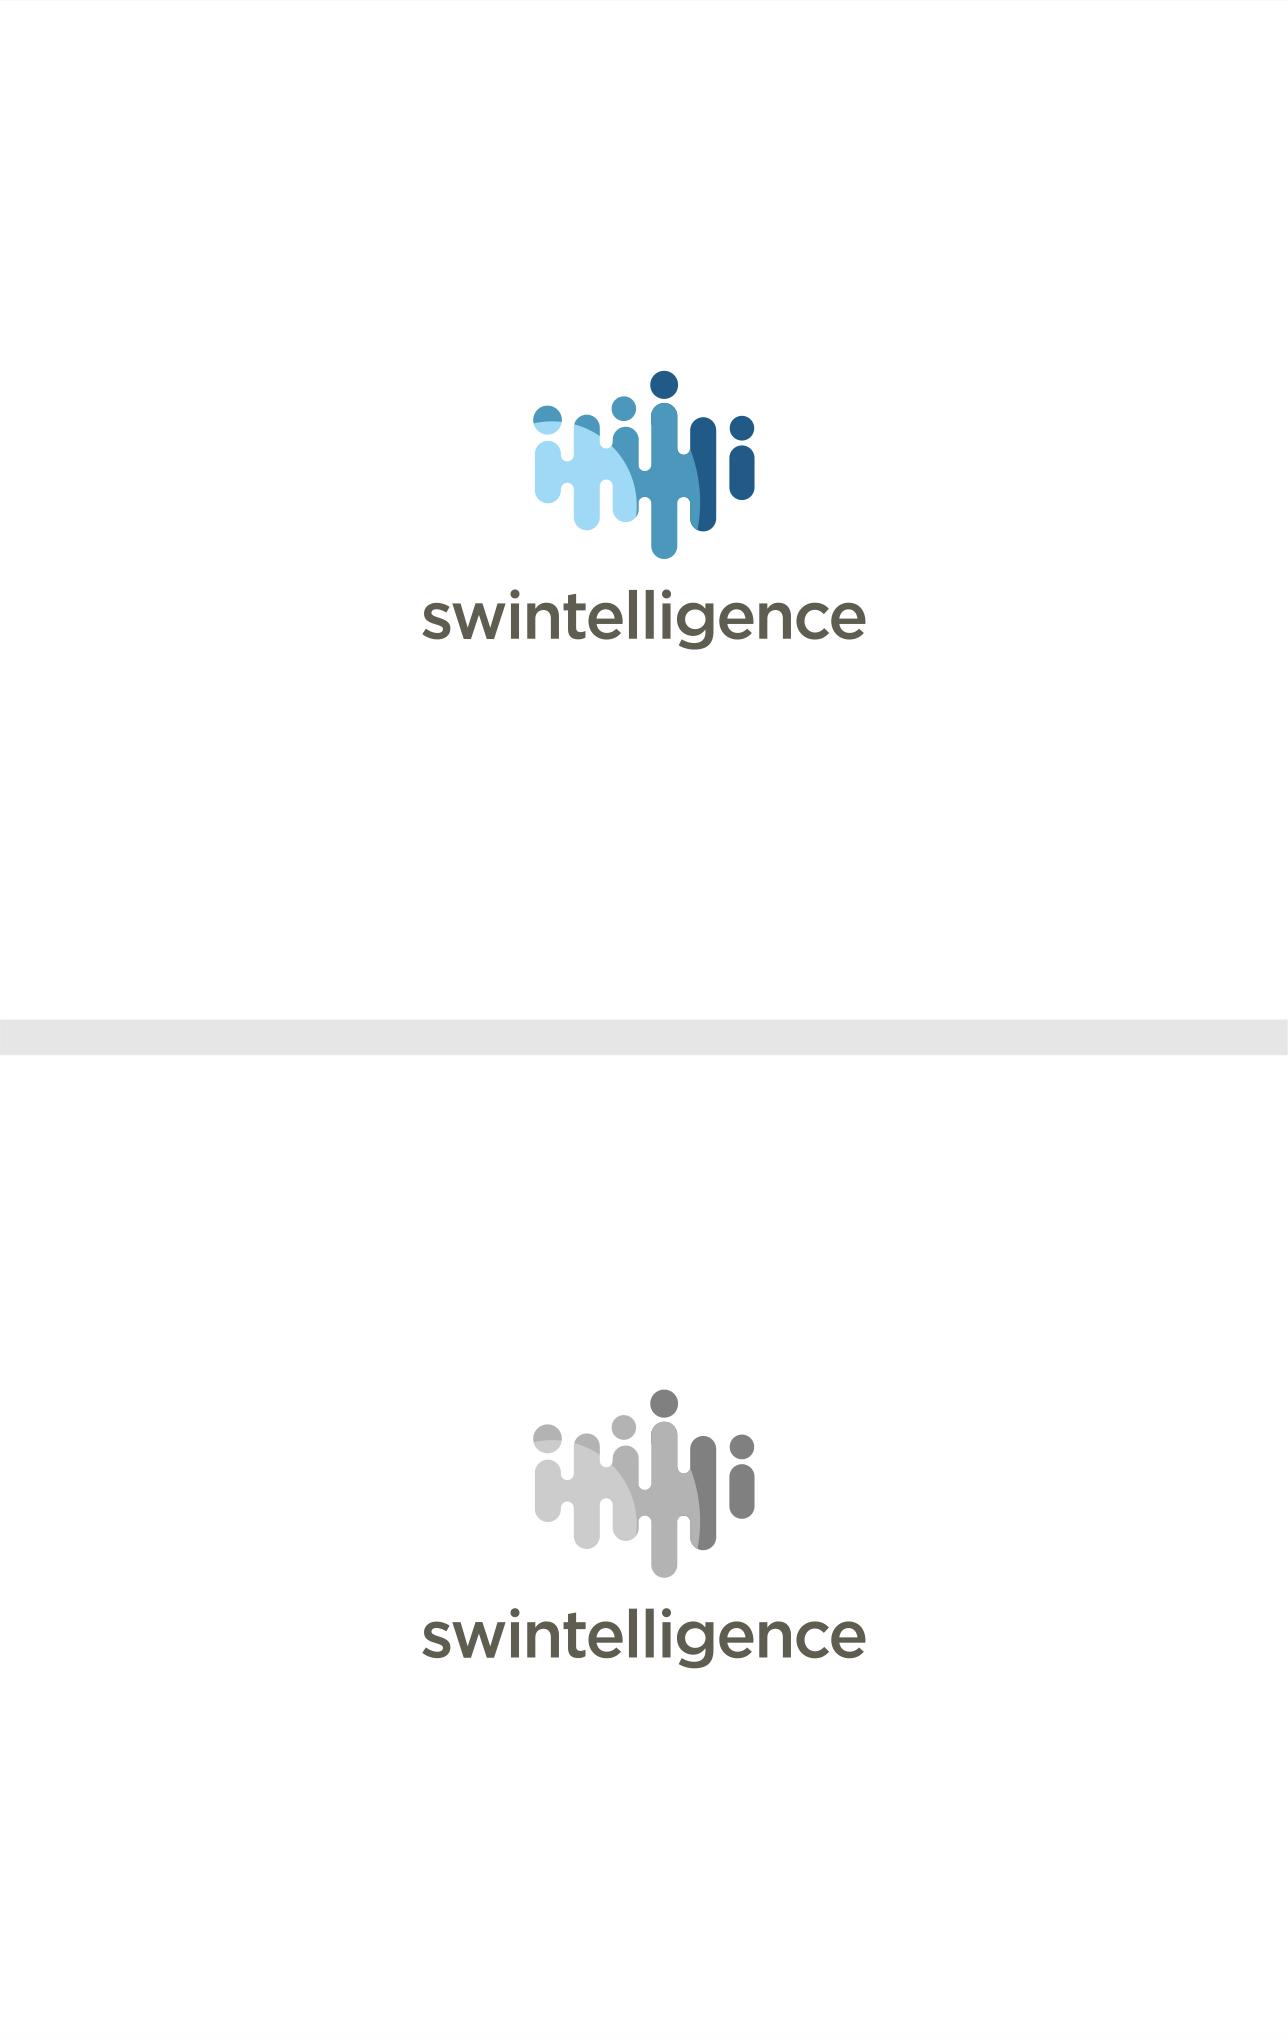 Create an attractive, inspiring logo for a new open innovation crowdsourcing platform